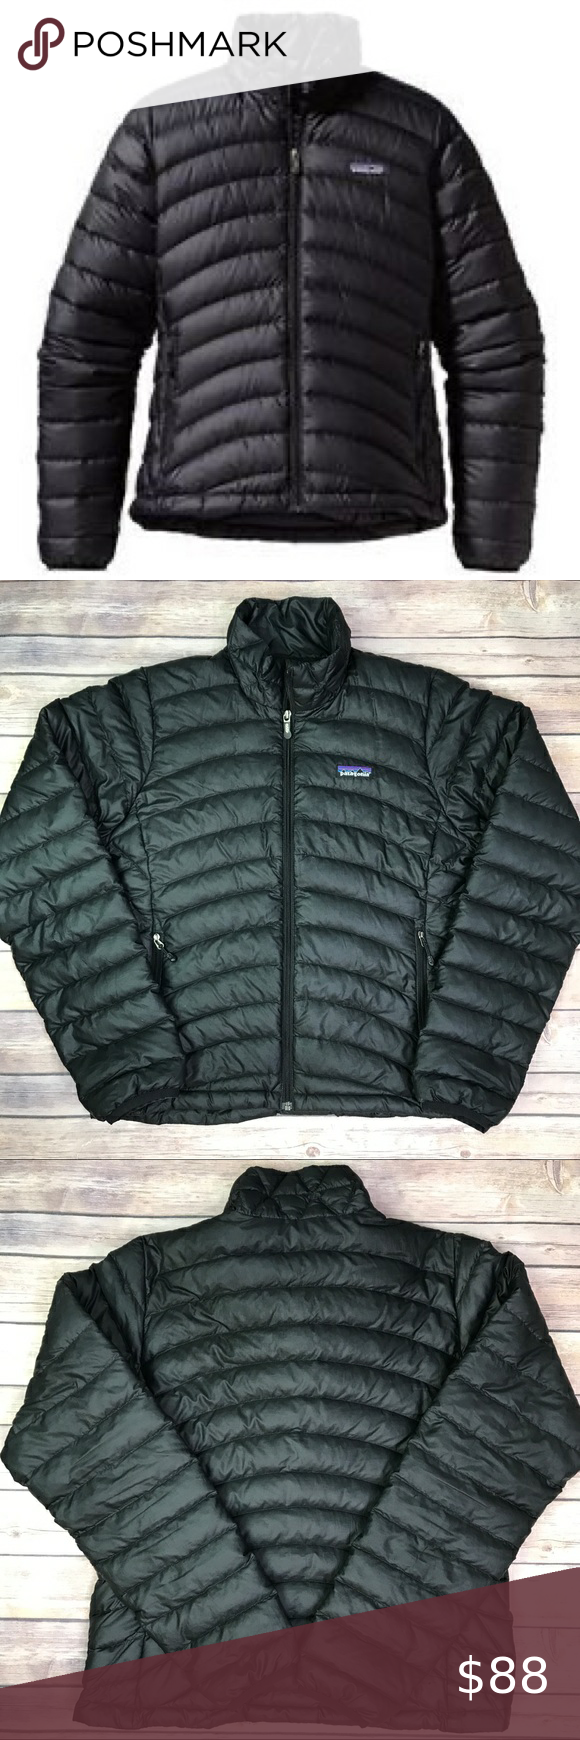 Patagonia Down Puffer Jacket Black Jackets Puffer Jackets Patagonia Jacket [ 1740 x 580 Pixel ]